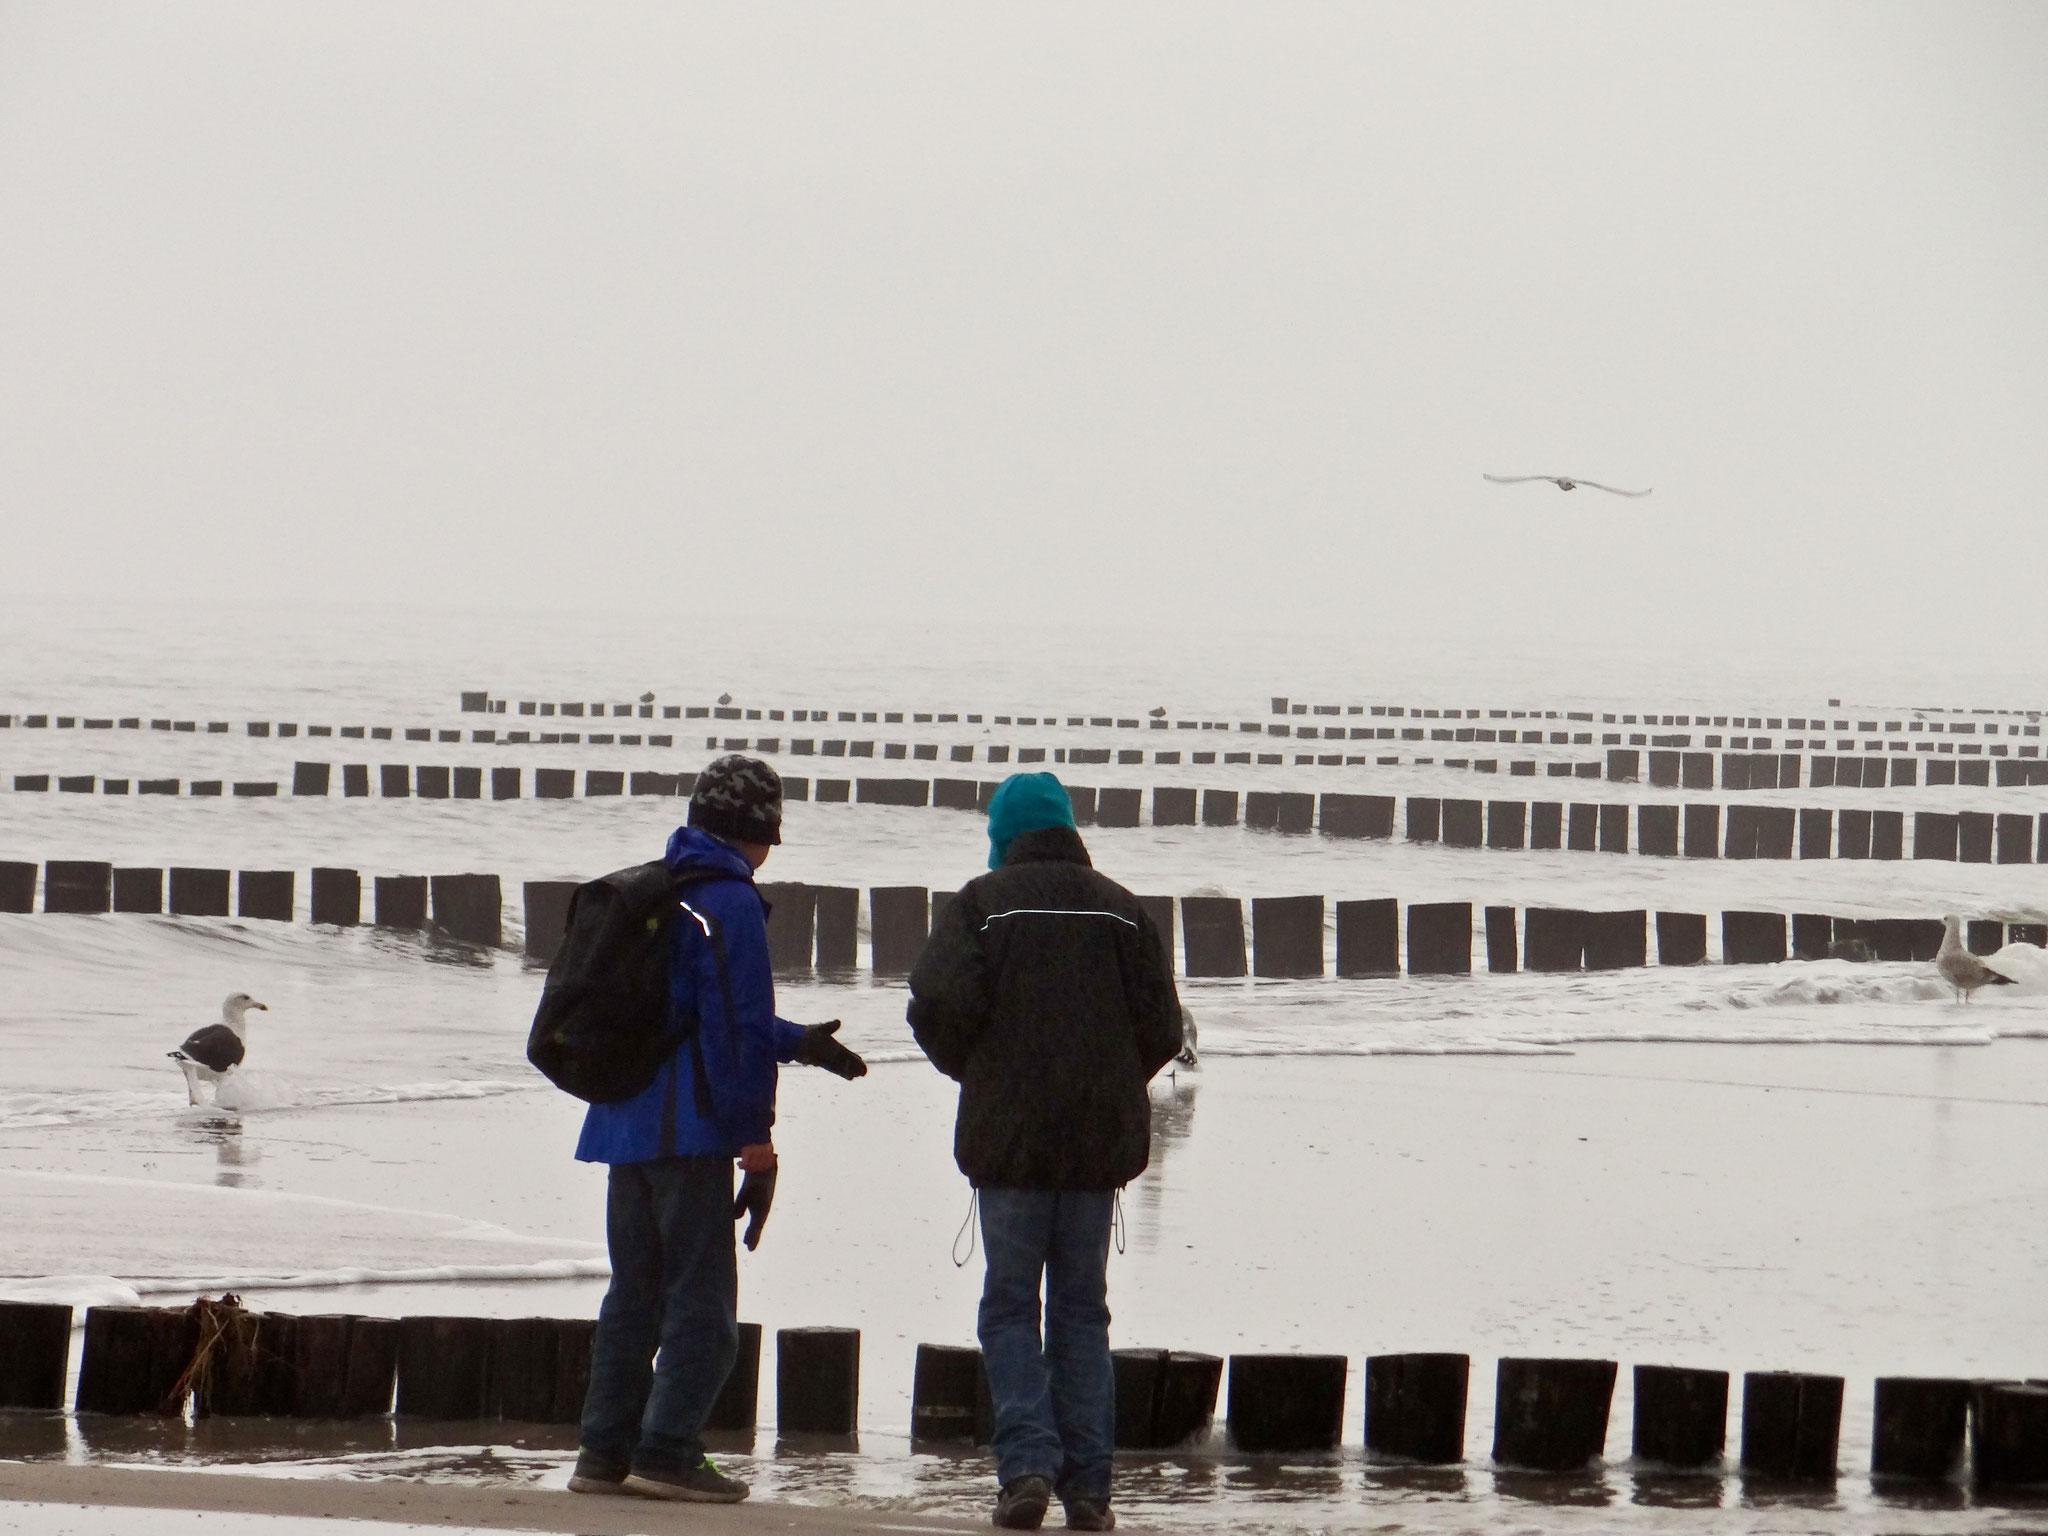 Küstenvögelbeobachtung am Strand im Oktober